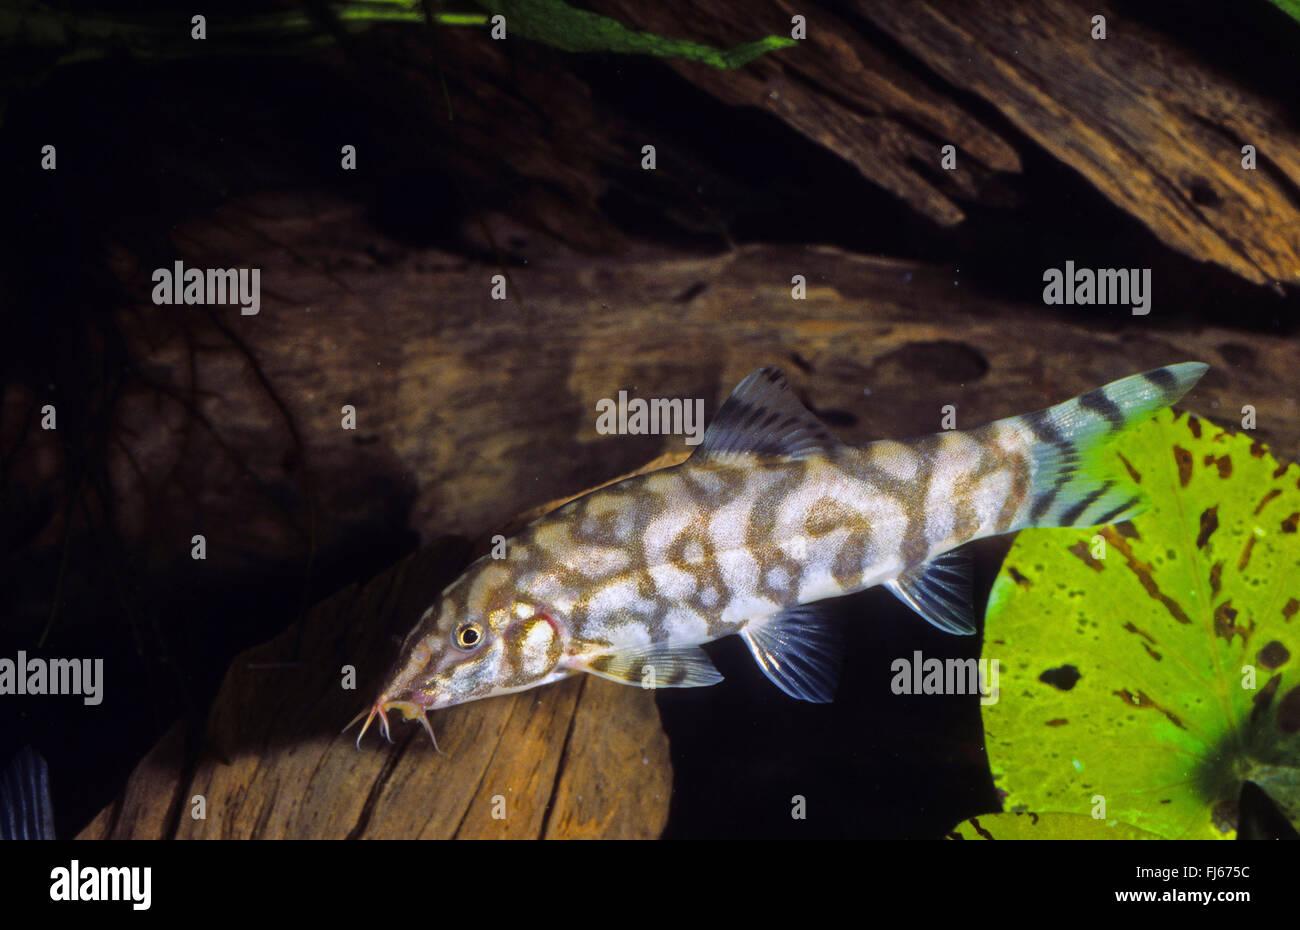 Pakistani loach, Yoyo loach (Botia almorhae, Botia lohachata), swimming - Stock Image